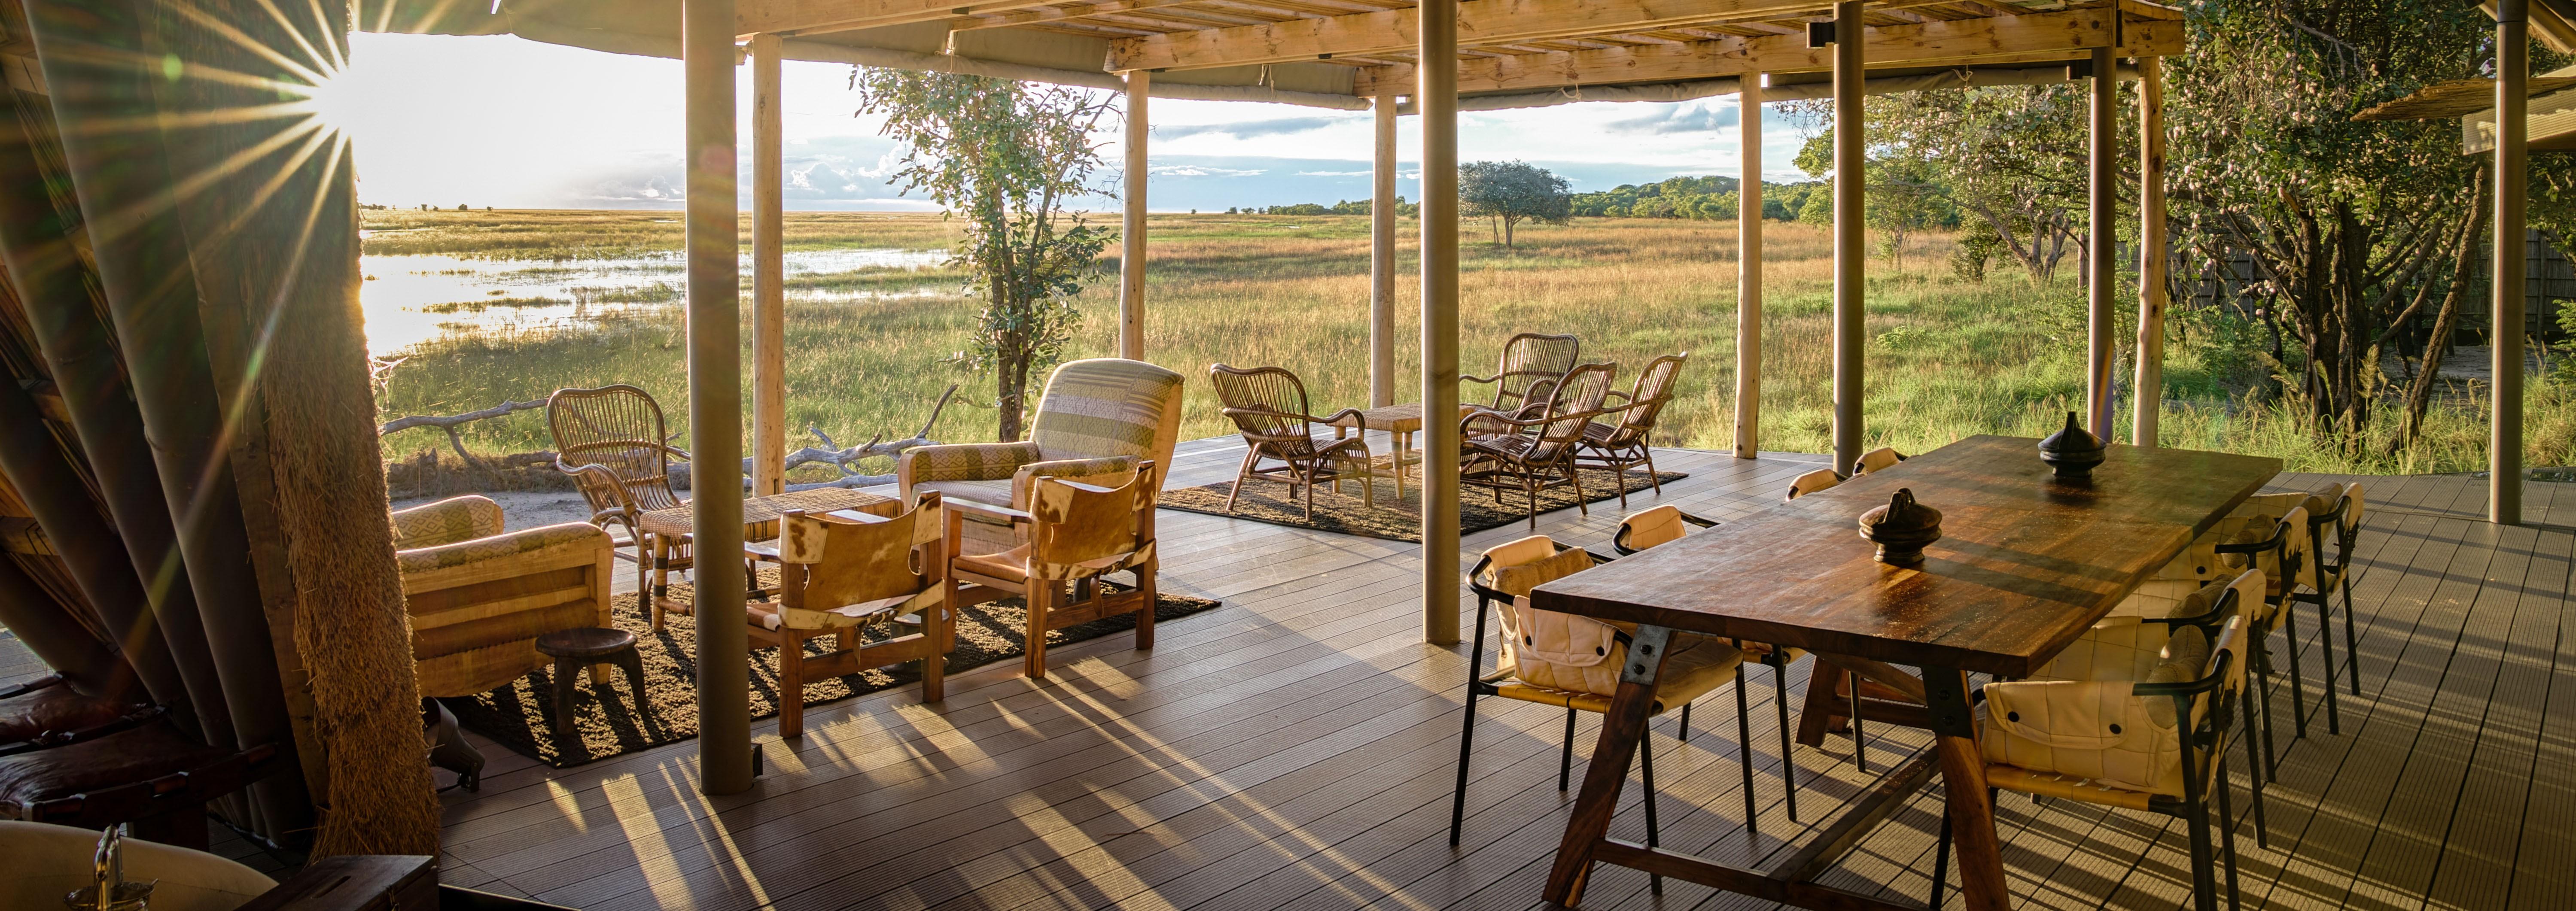 king-lewanika-camp-dining-room